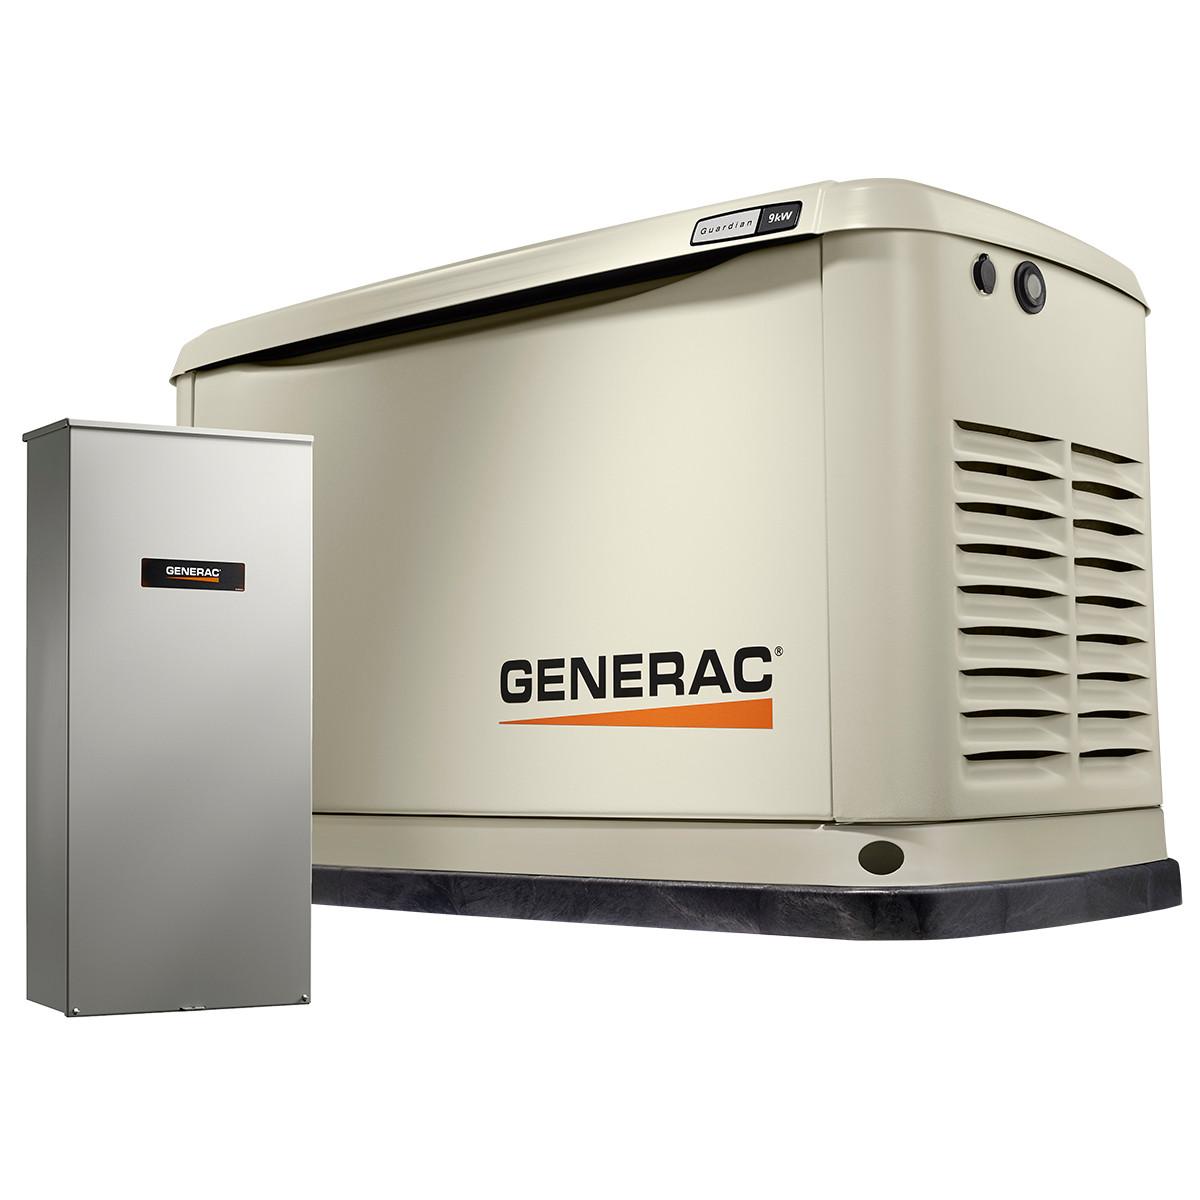 hight resolution of generac 7030 9kw generator 100a 16 circuit transfer switch 200 amp panel wiring diagram wiring diagram for generac 22kw free download